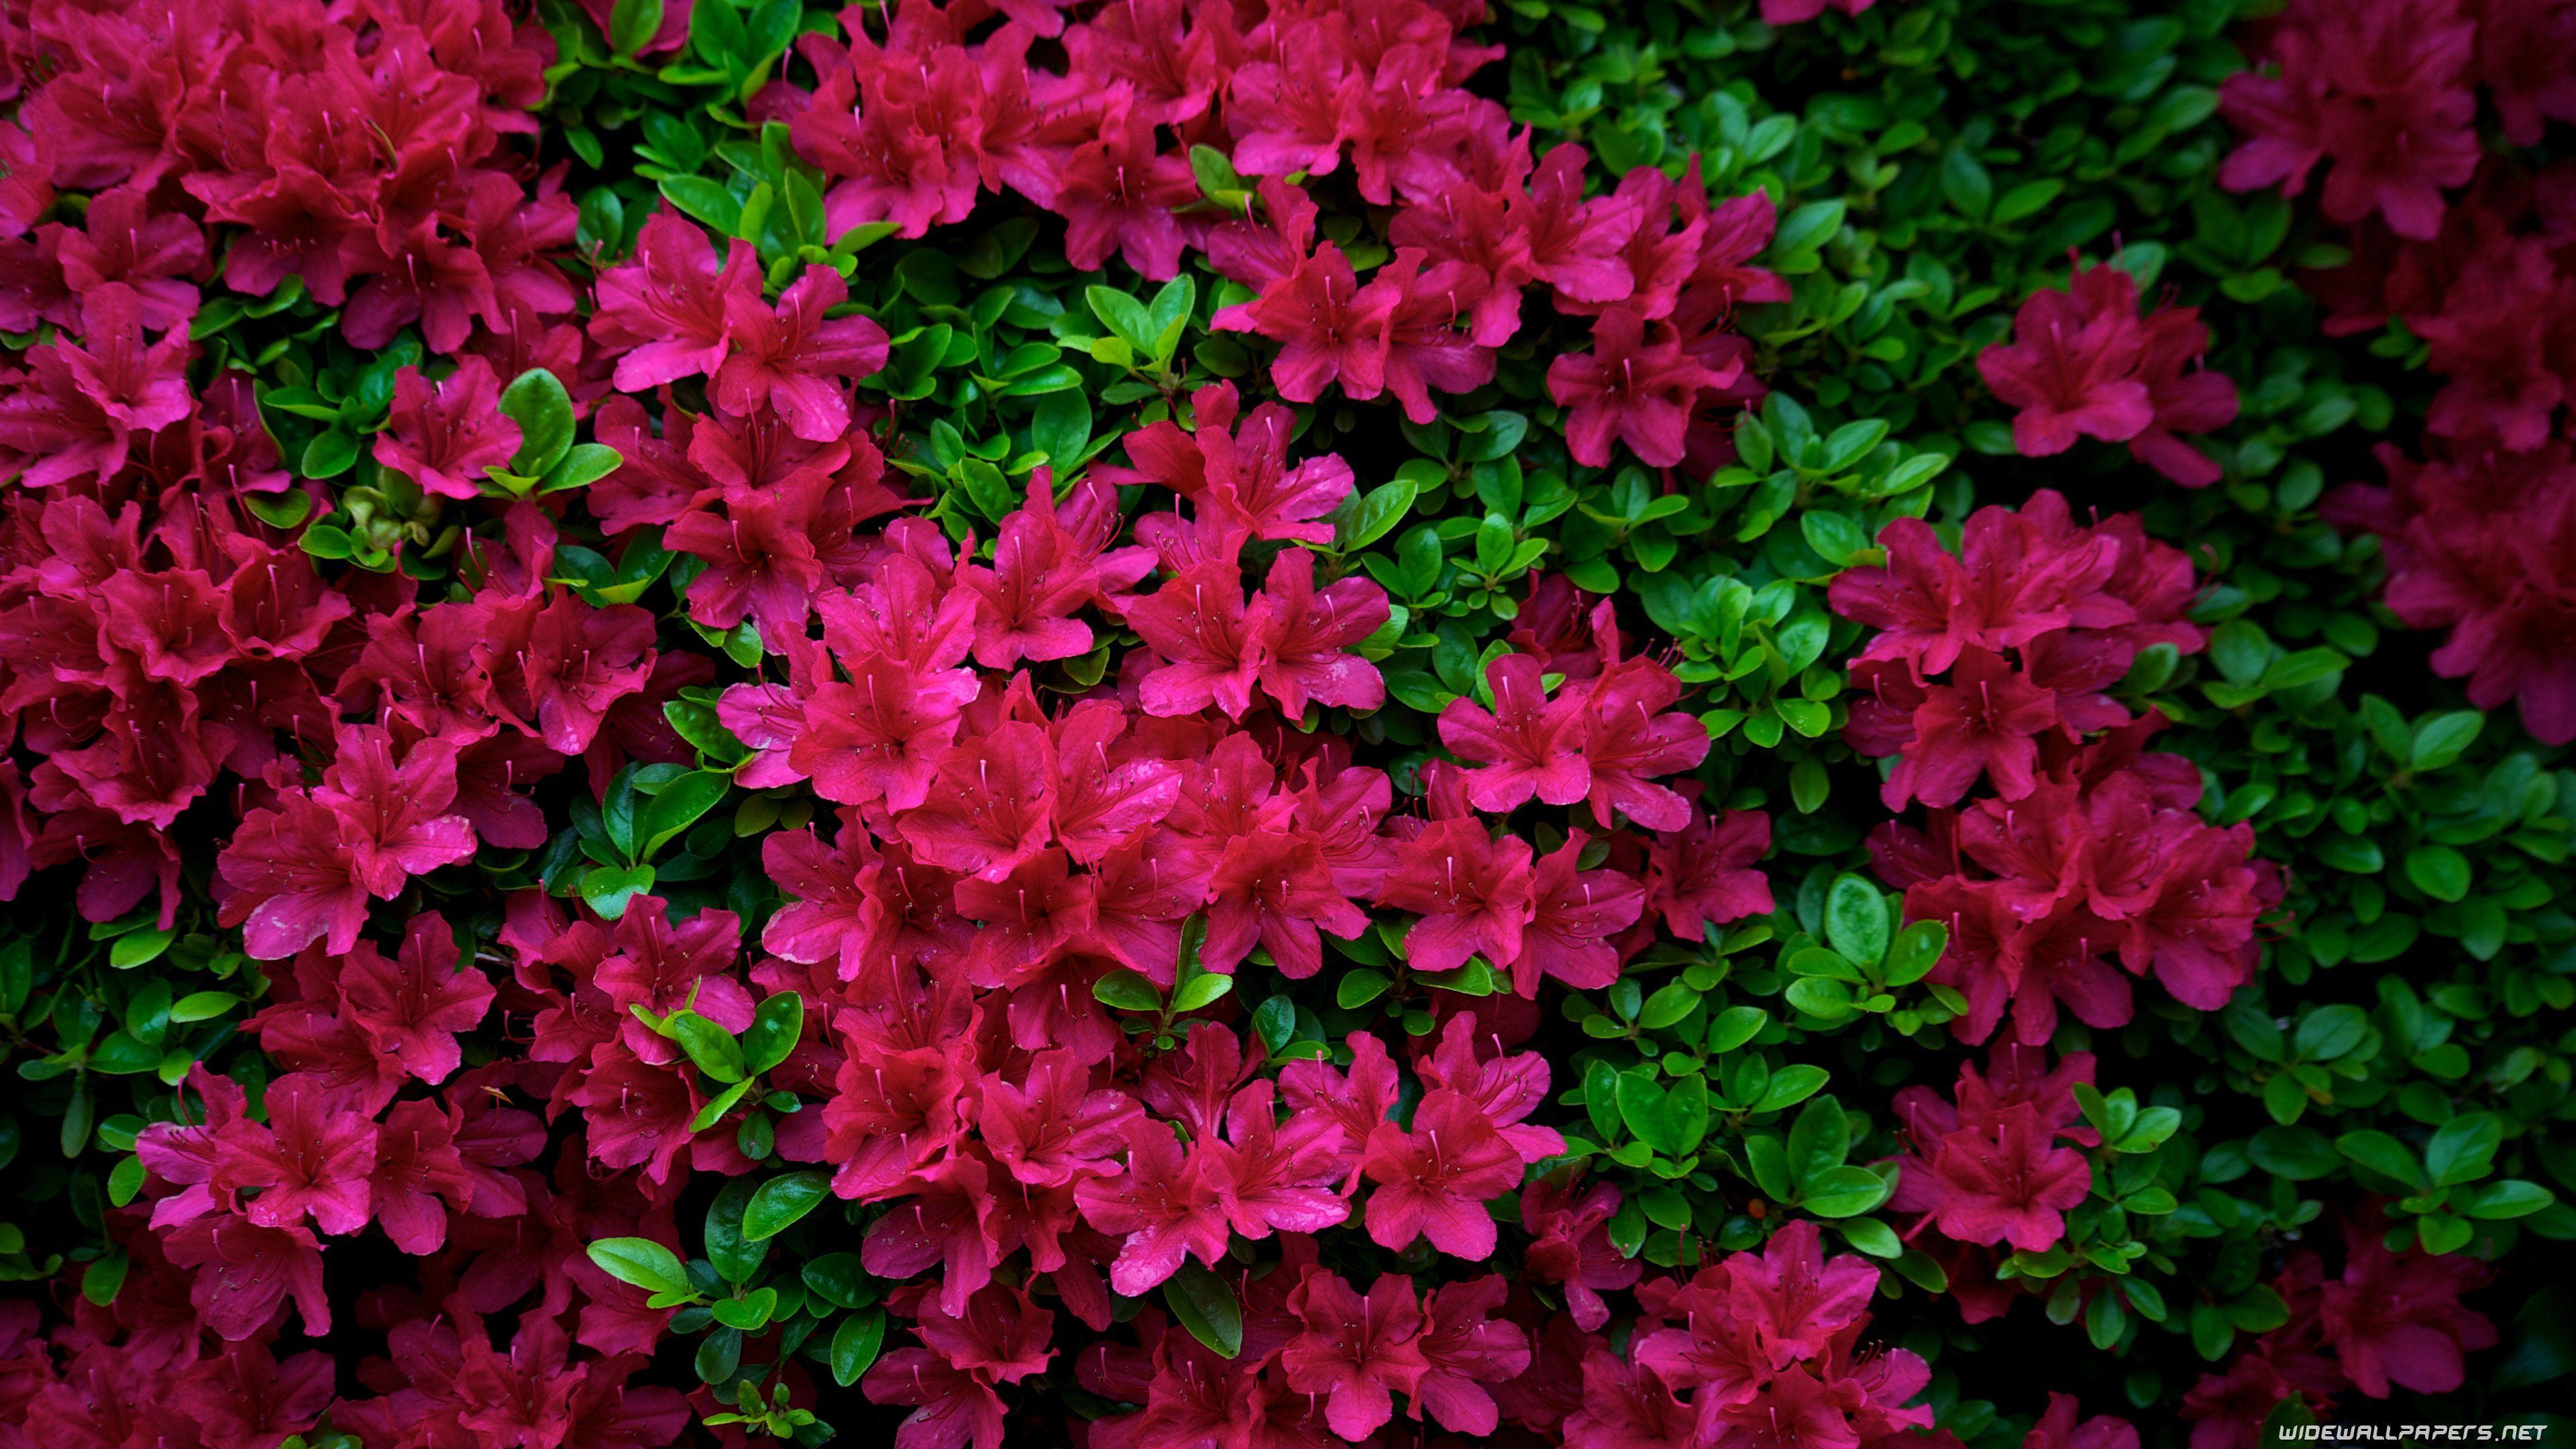 Ultra Hd Flower Wallpapers Top Free Ultra Hd Flower Backgrounds Wallpaperaccess